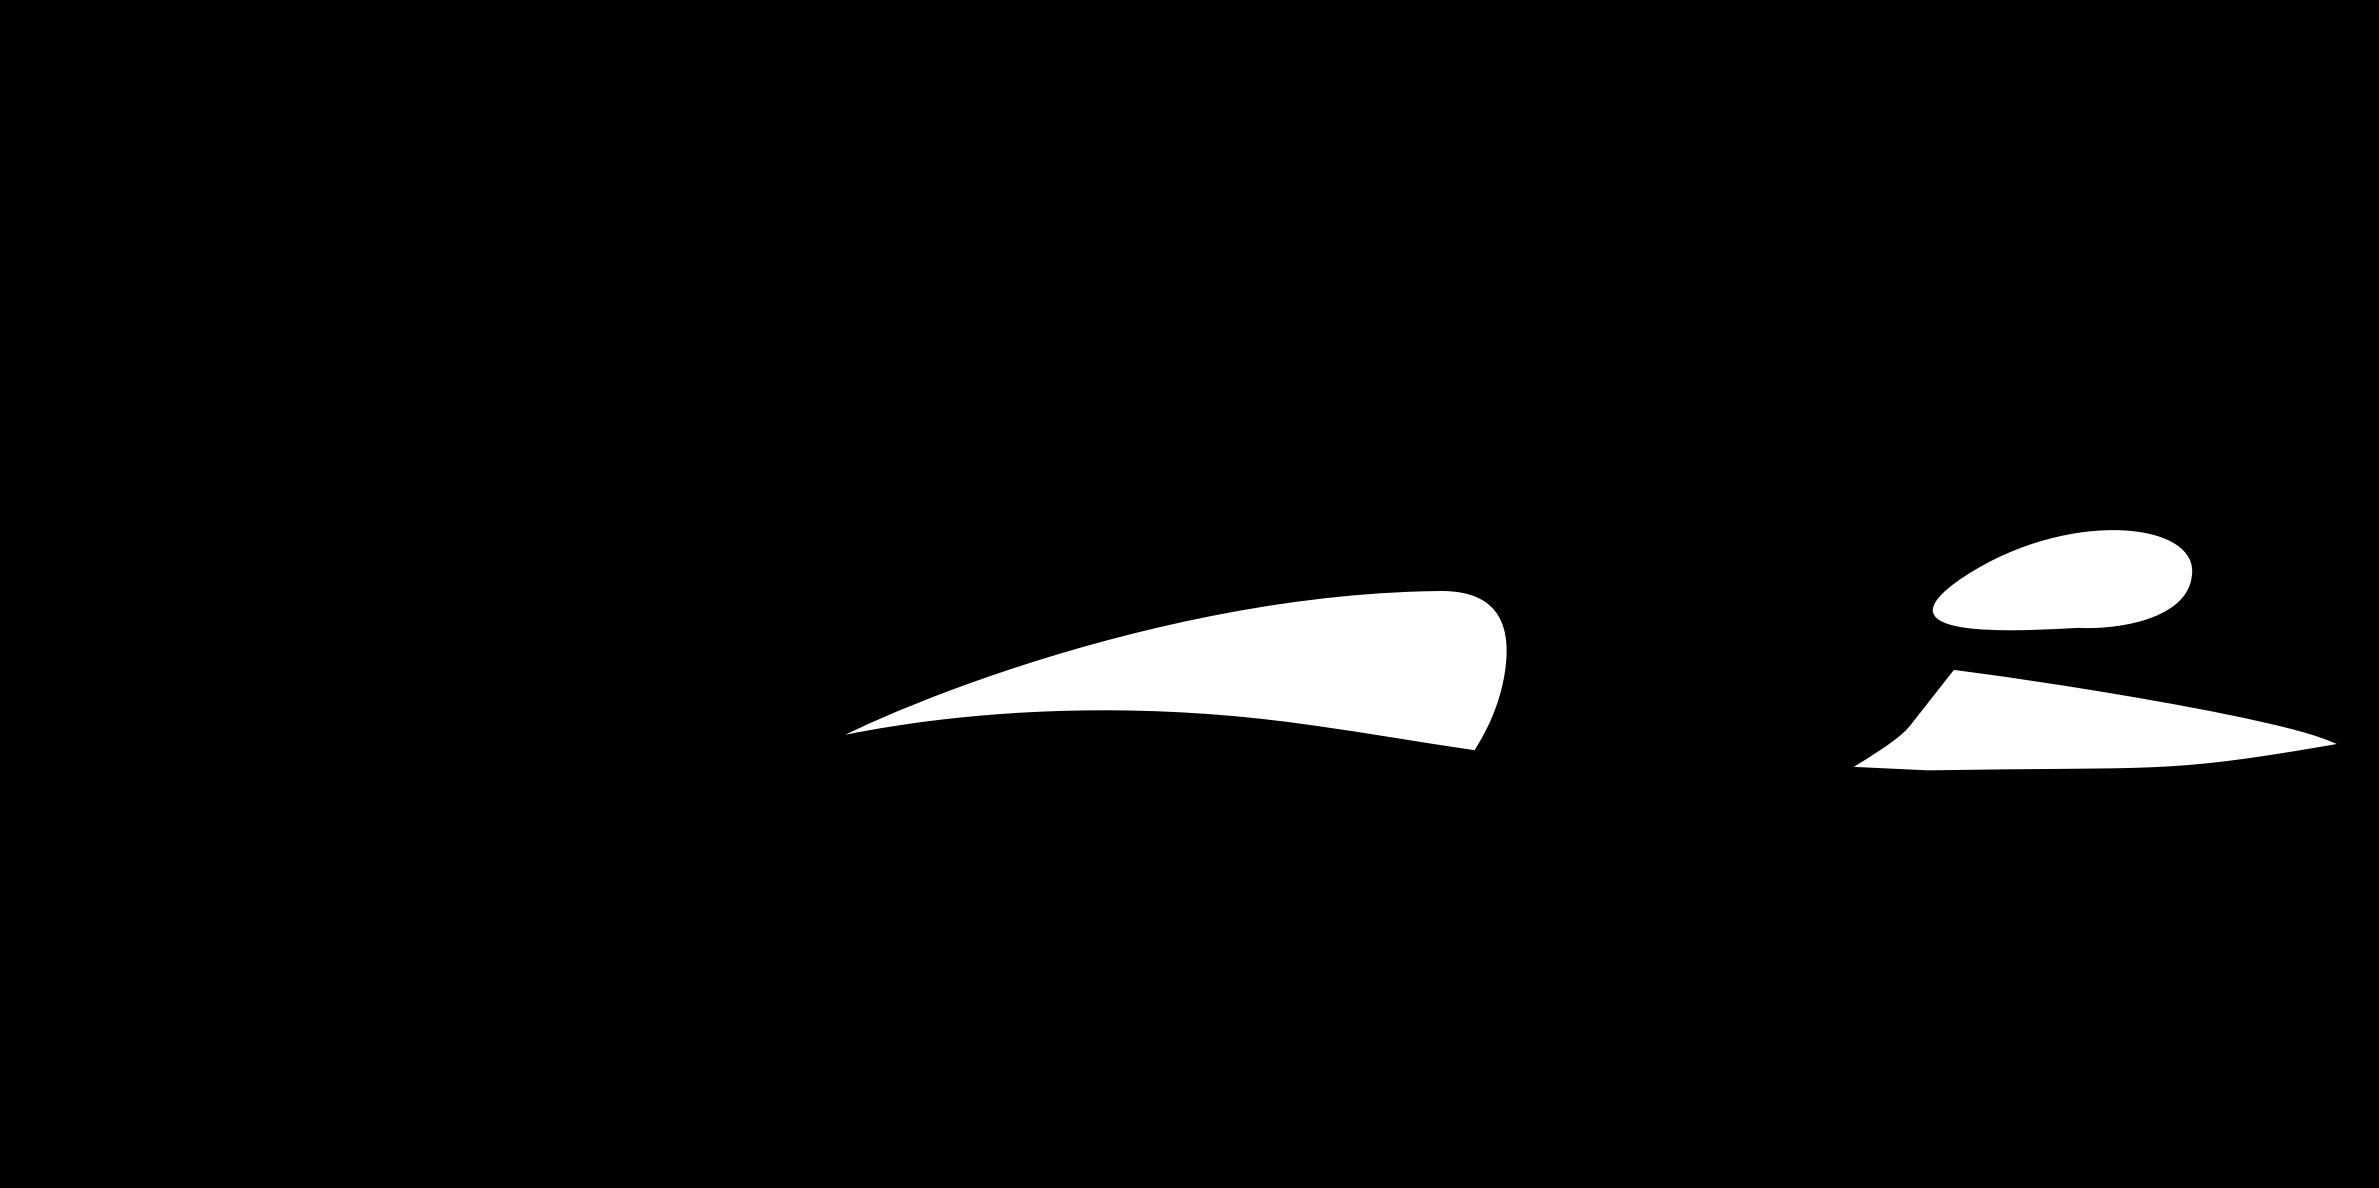 Clipart whale silhouette, Clipart whale silhouette.